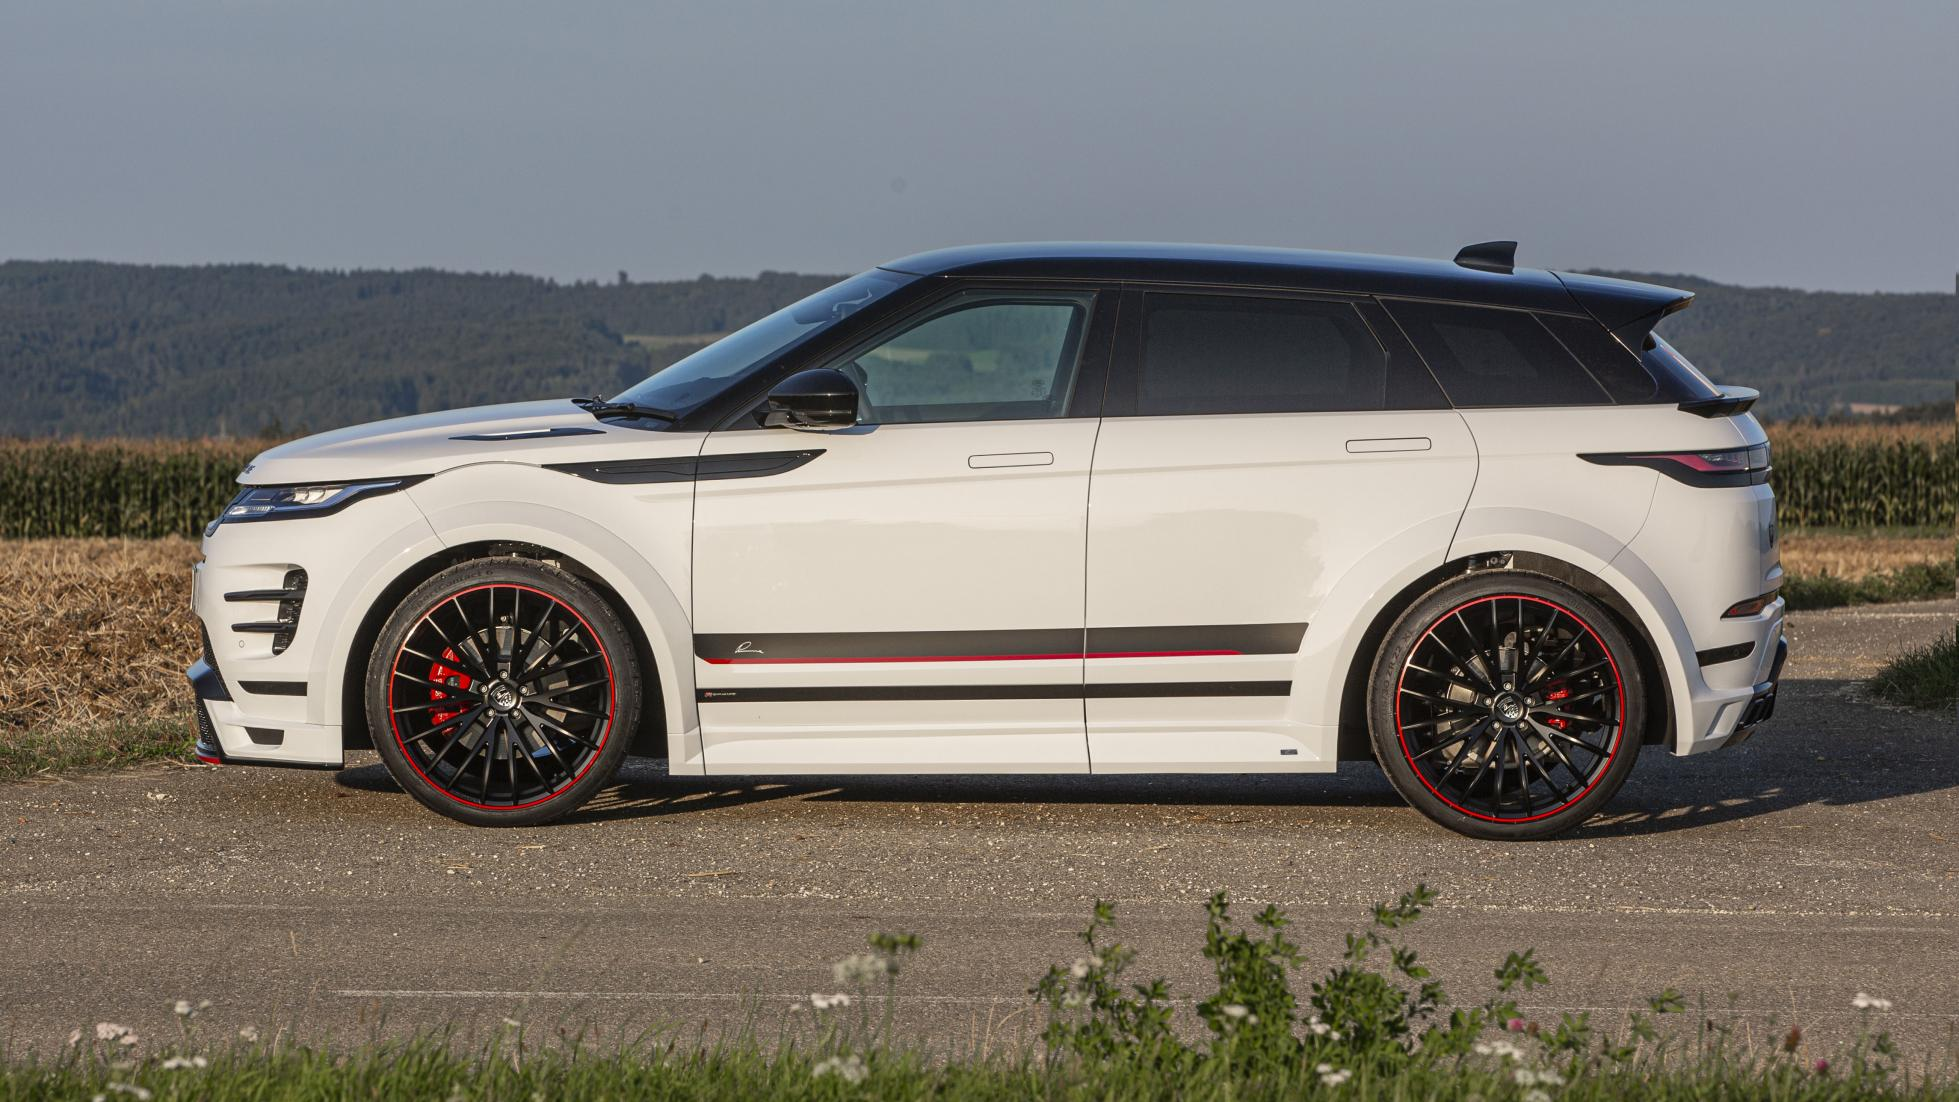 Range-Rover-Evoque-by-Lumma-Design-4